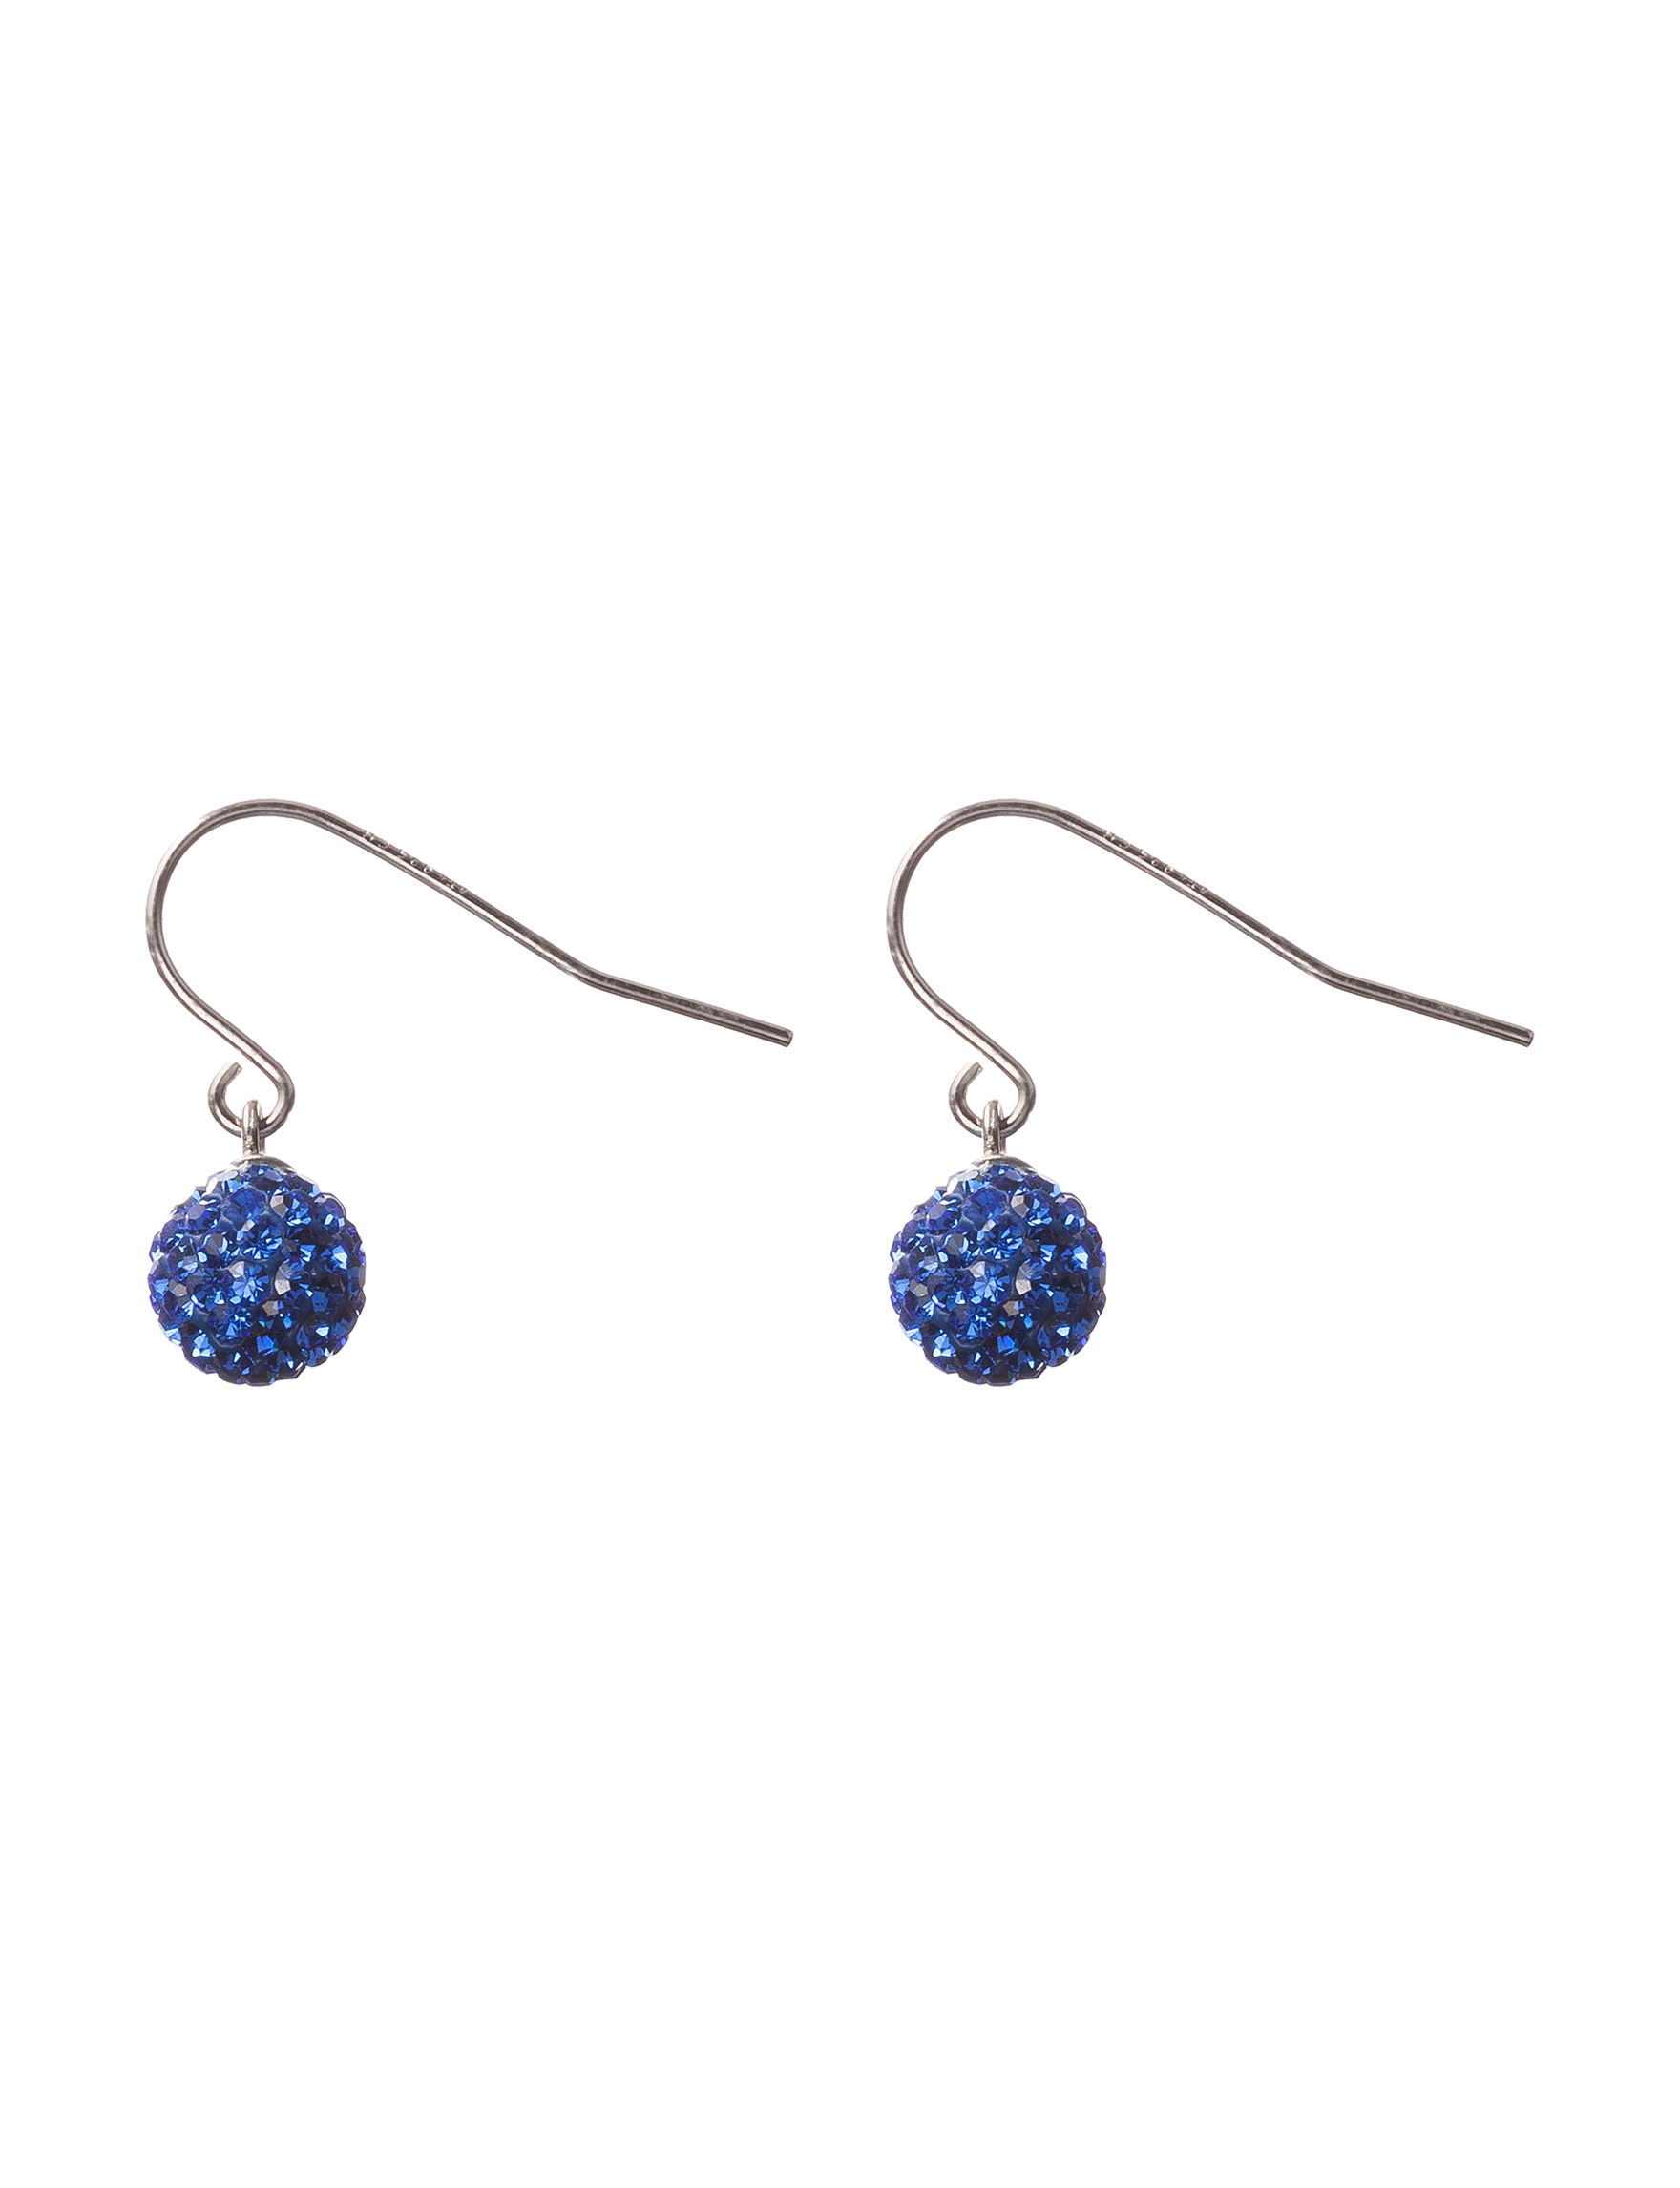 Athra Silver Drops Earrings Fine Jewelry